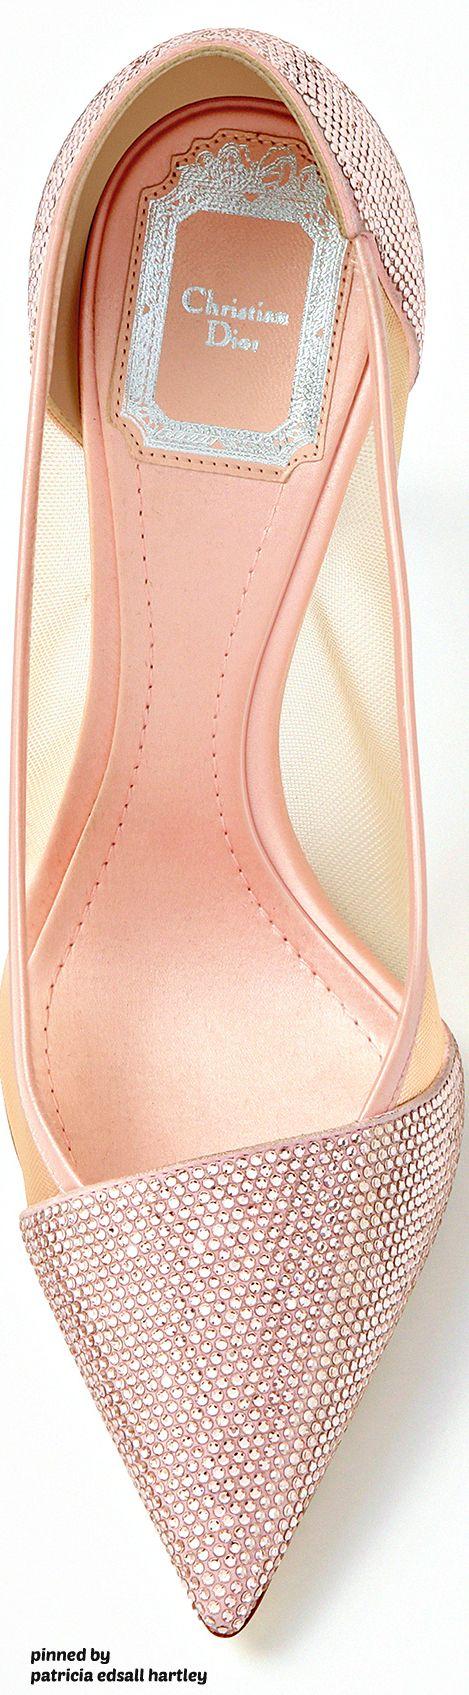 Rosamaria G Frangini | ShoeAddict | Christian Dior 2016 Blush* Shoes